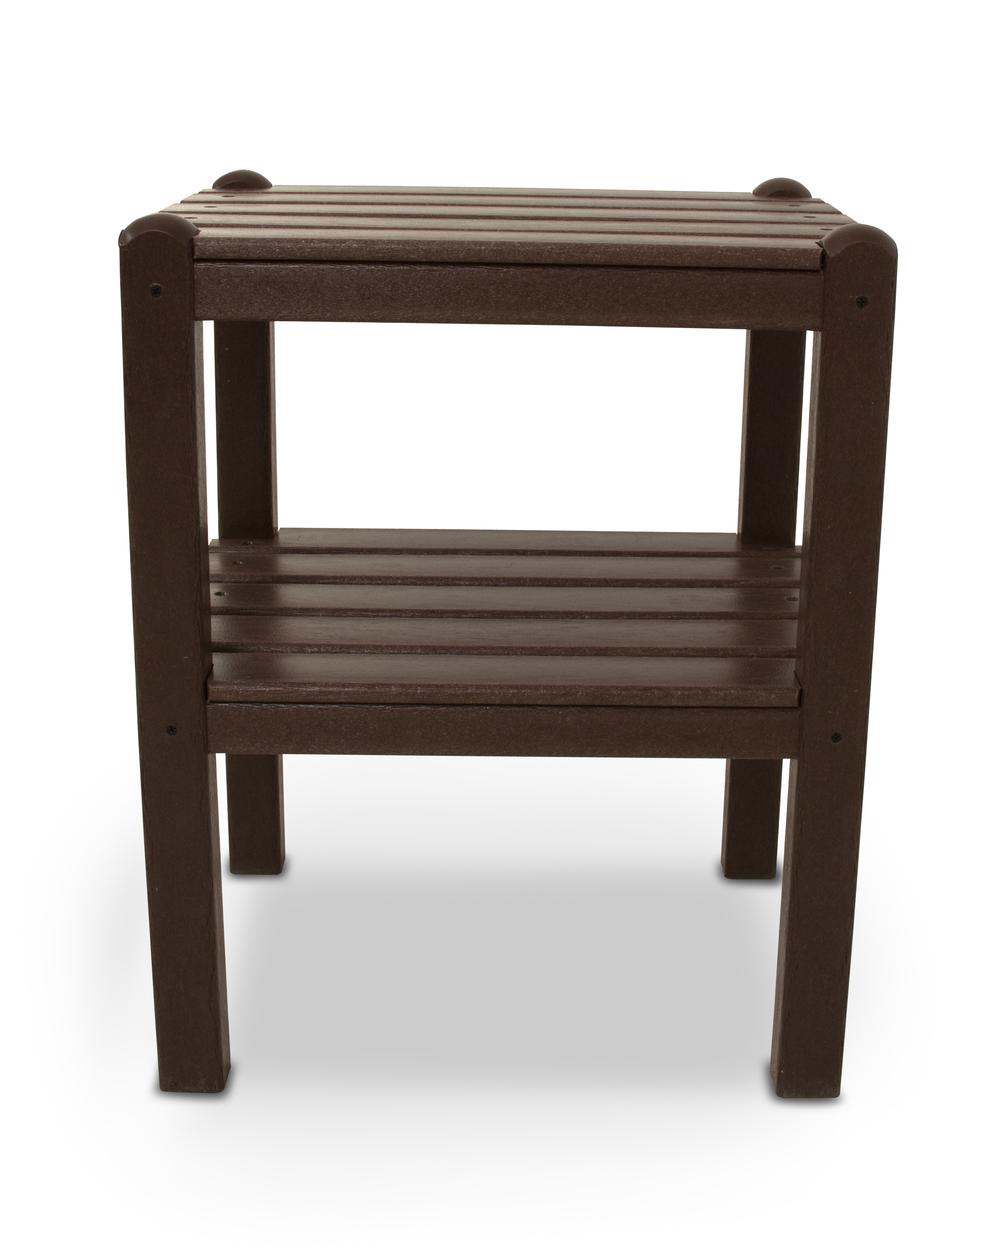 Polywood - Two Shelf Side Table